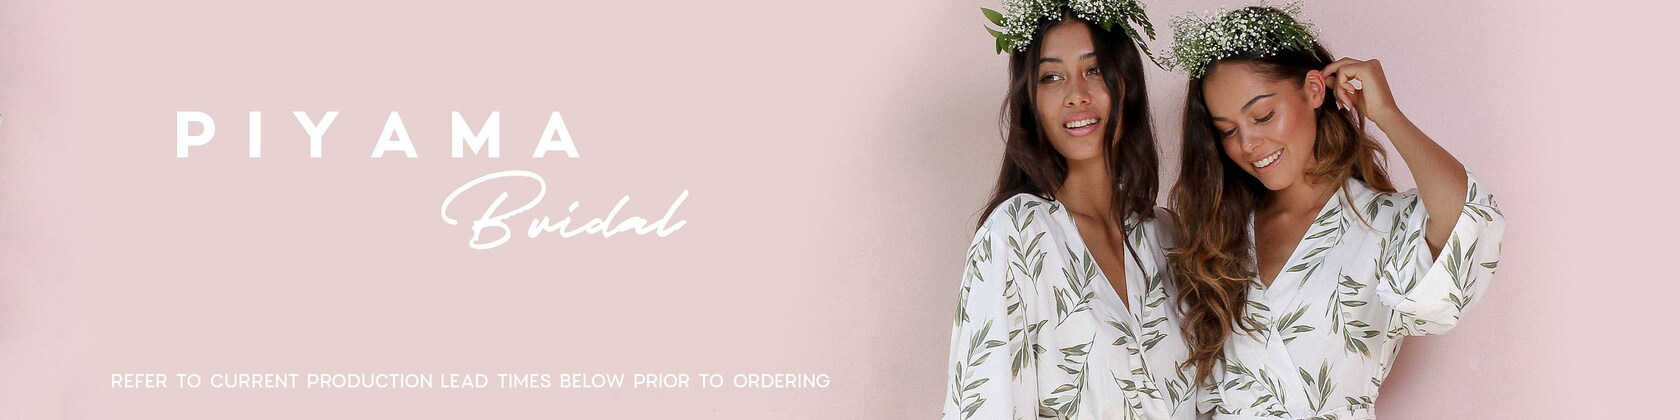 562a4b58e8 Bespoke High Quality Bridesmaid Robes Sleepwear Gifts by Piyama